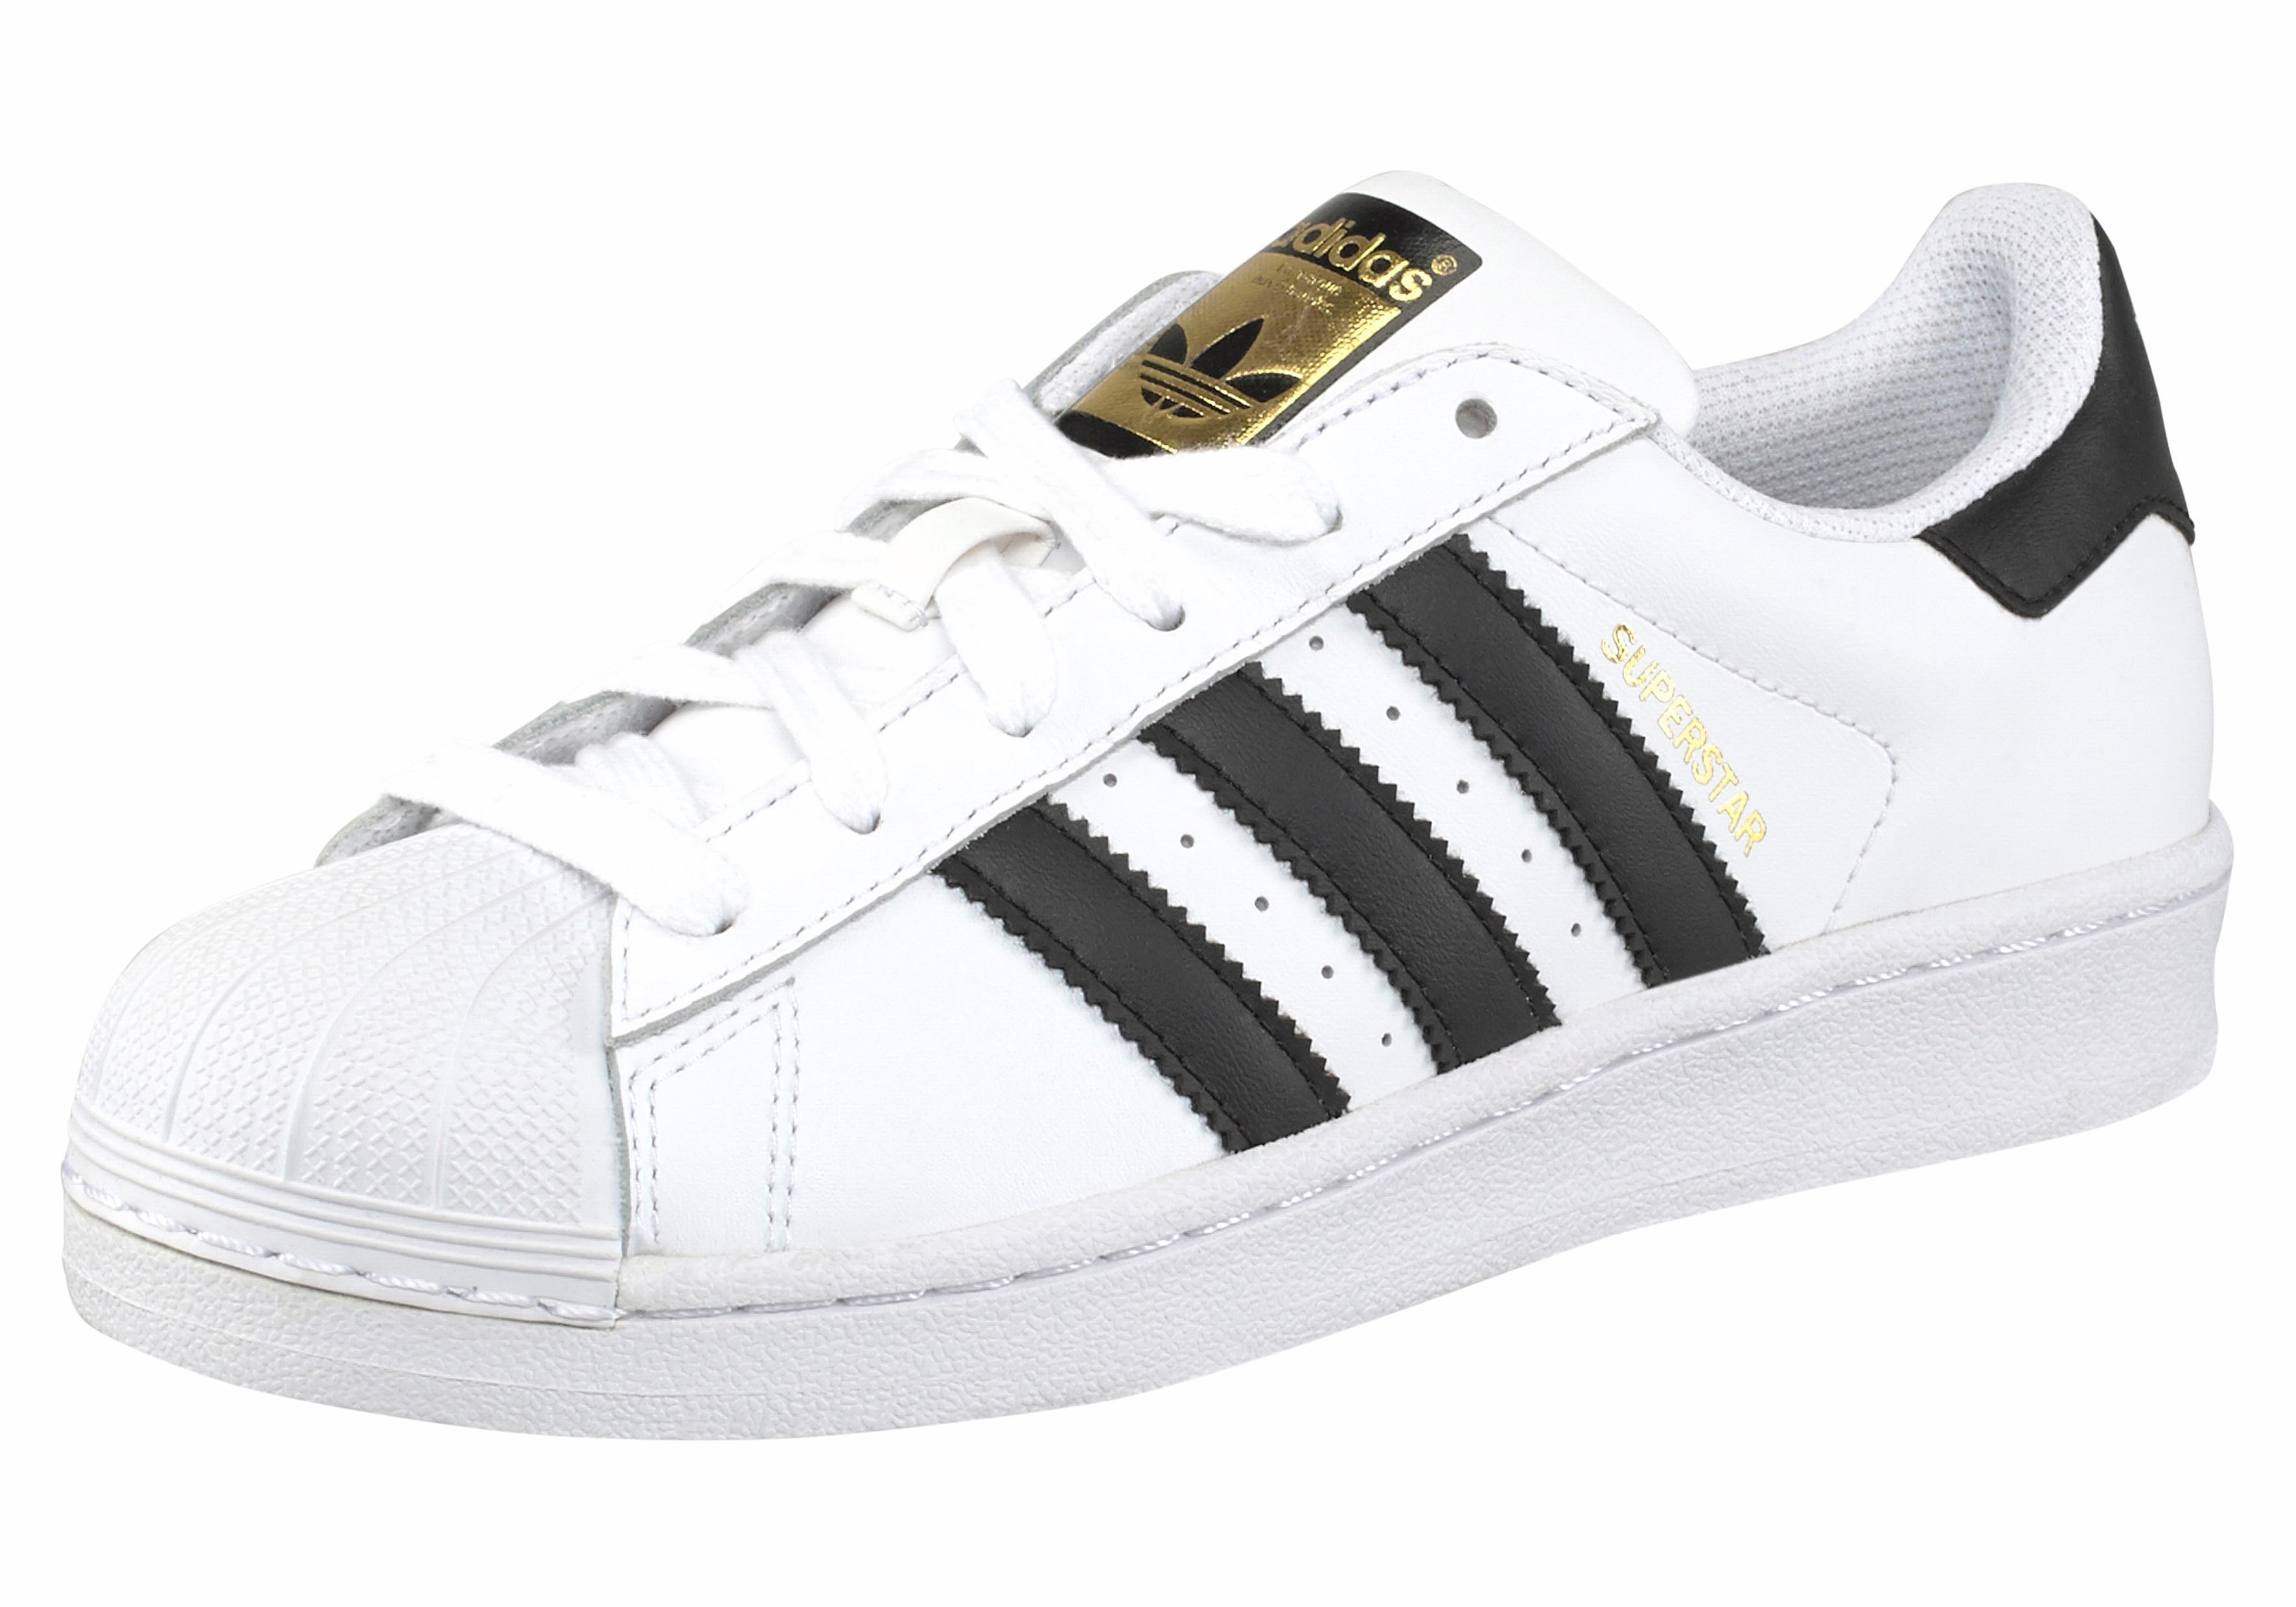 fa9e5ca153d ... Nike Sportswear sneakers »Grandstand II«, Nike Sportswear sneakers  »Wmns Air Max Axis«, LASCANA sneakers van textiel, adidas Originals sneakers  » ...